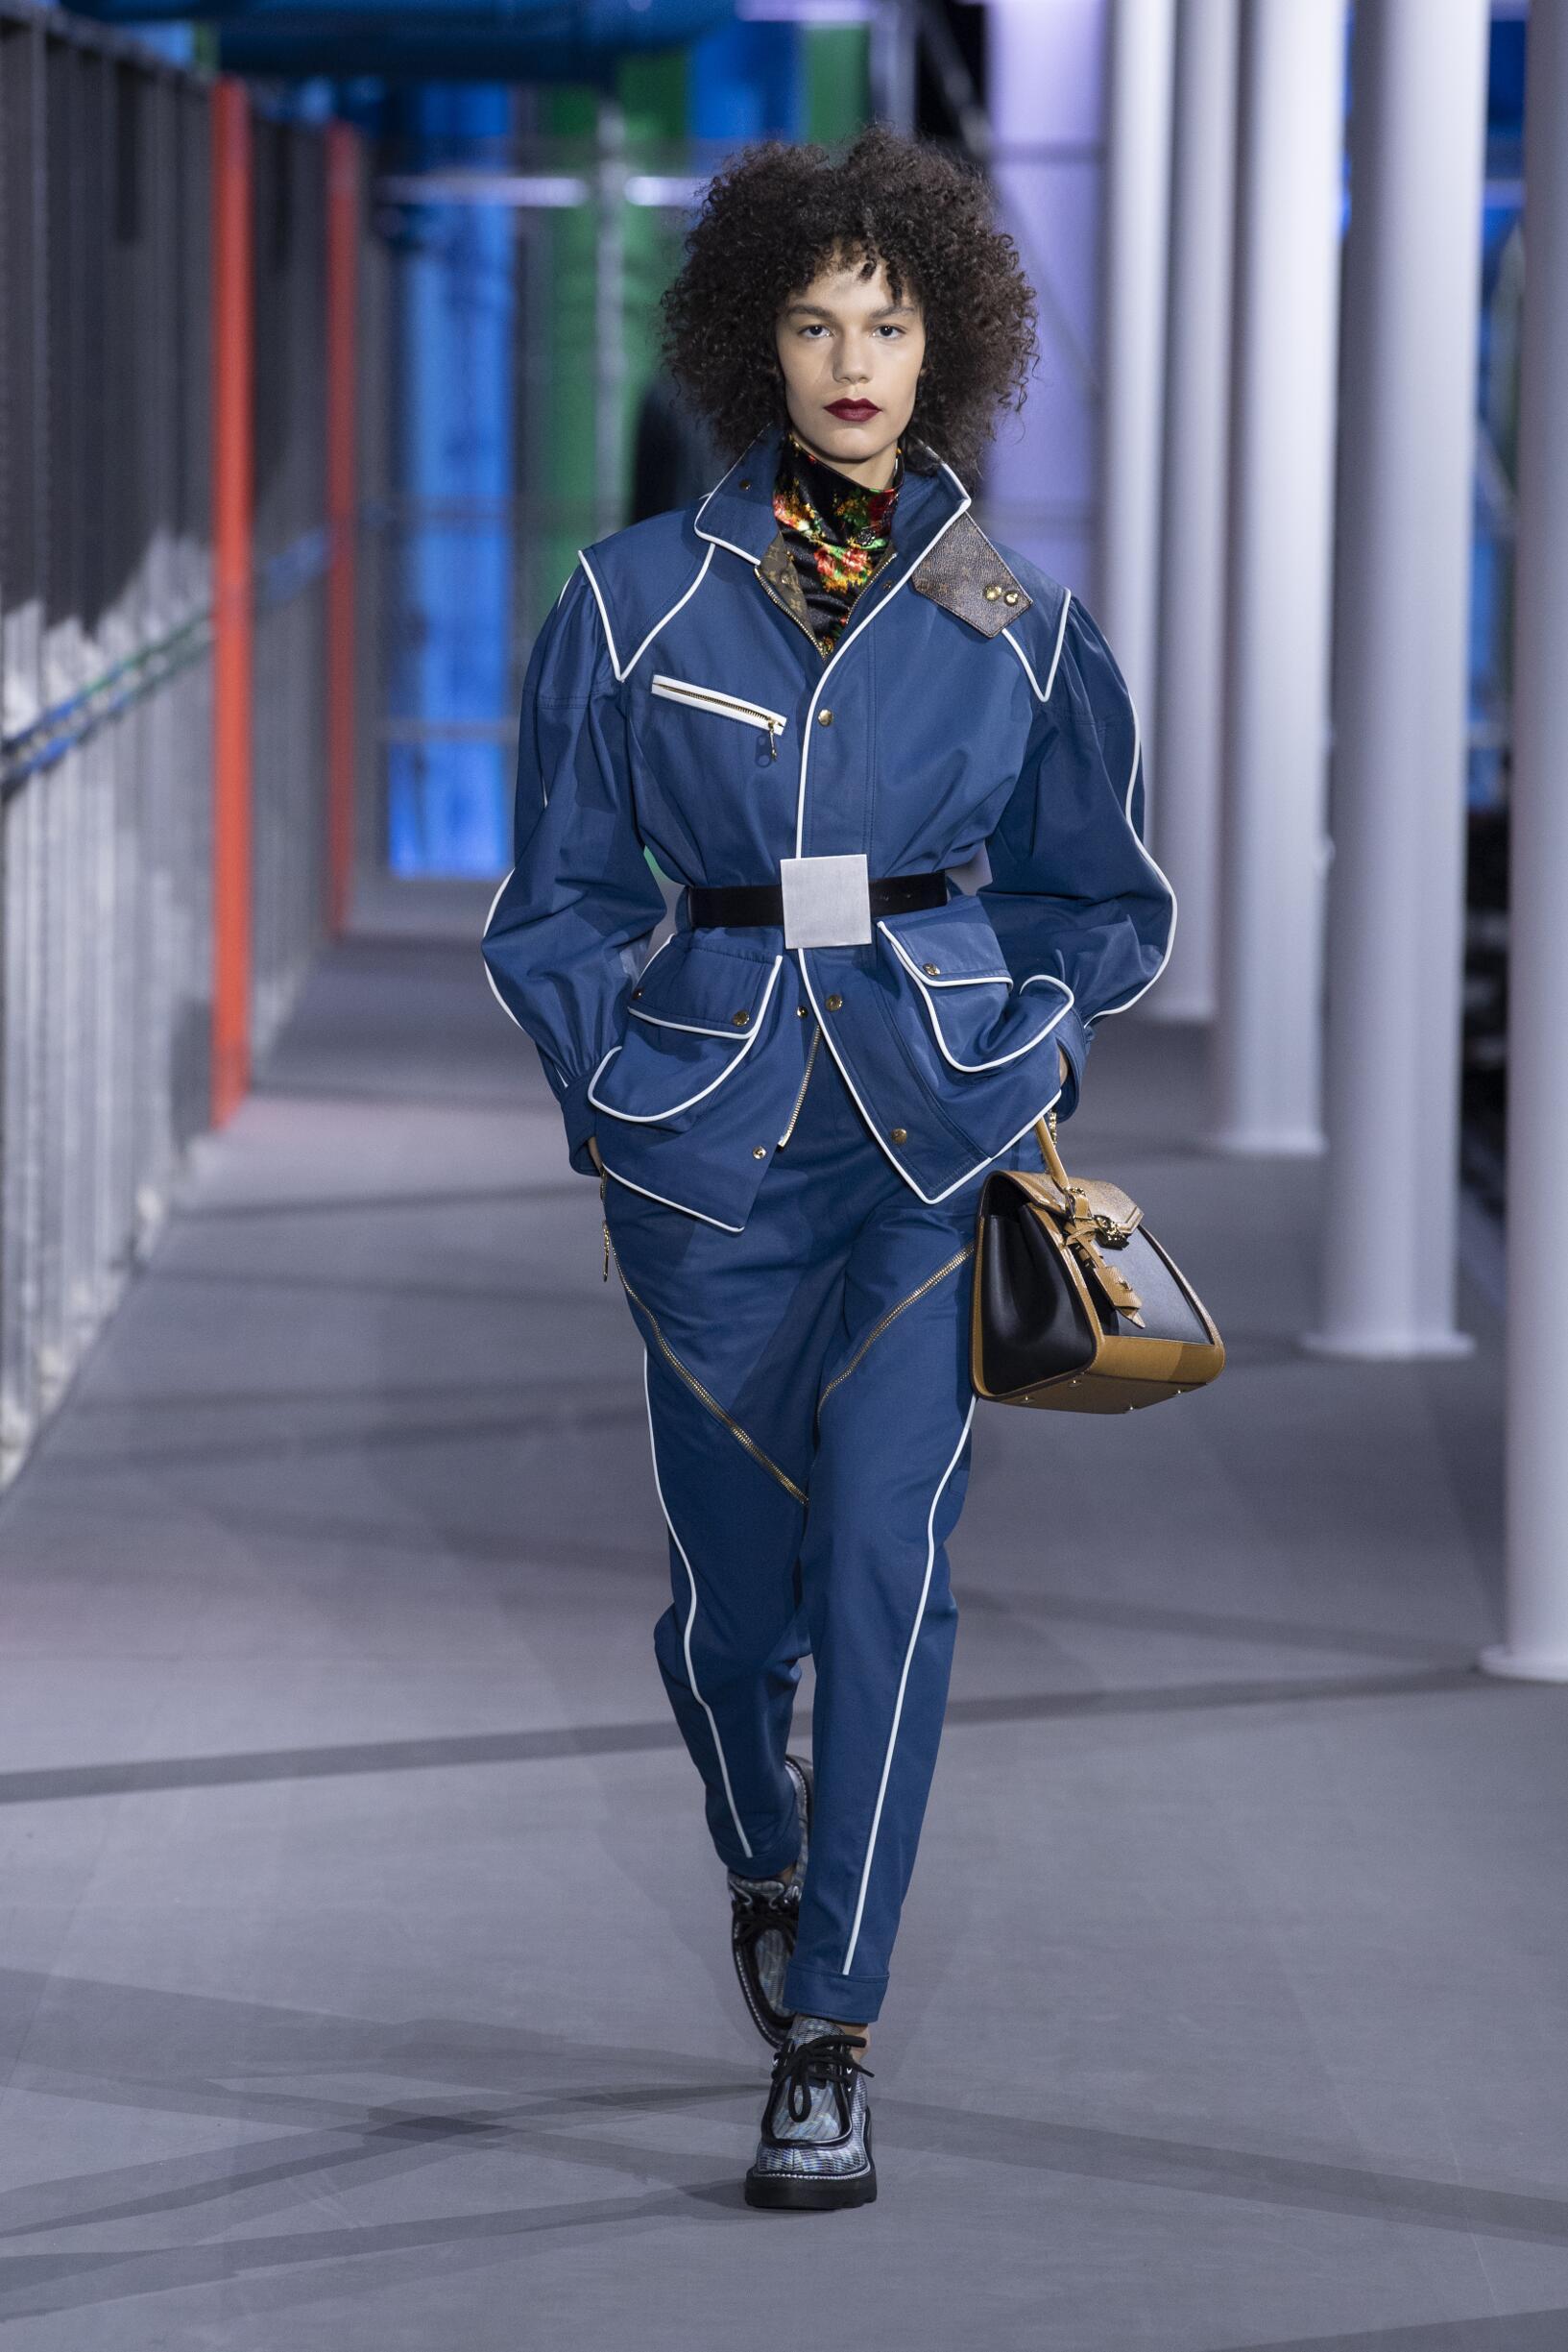 Catwalk Louis Vuitton Woman Fashion Show Winter 2019